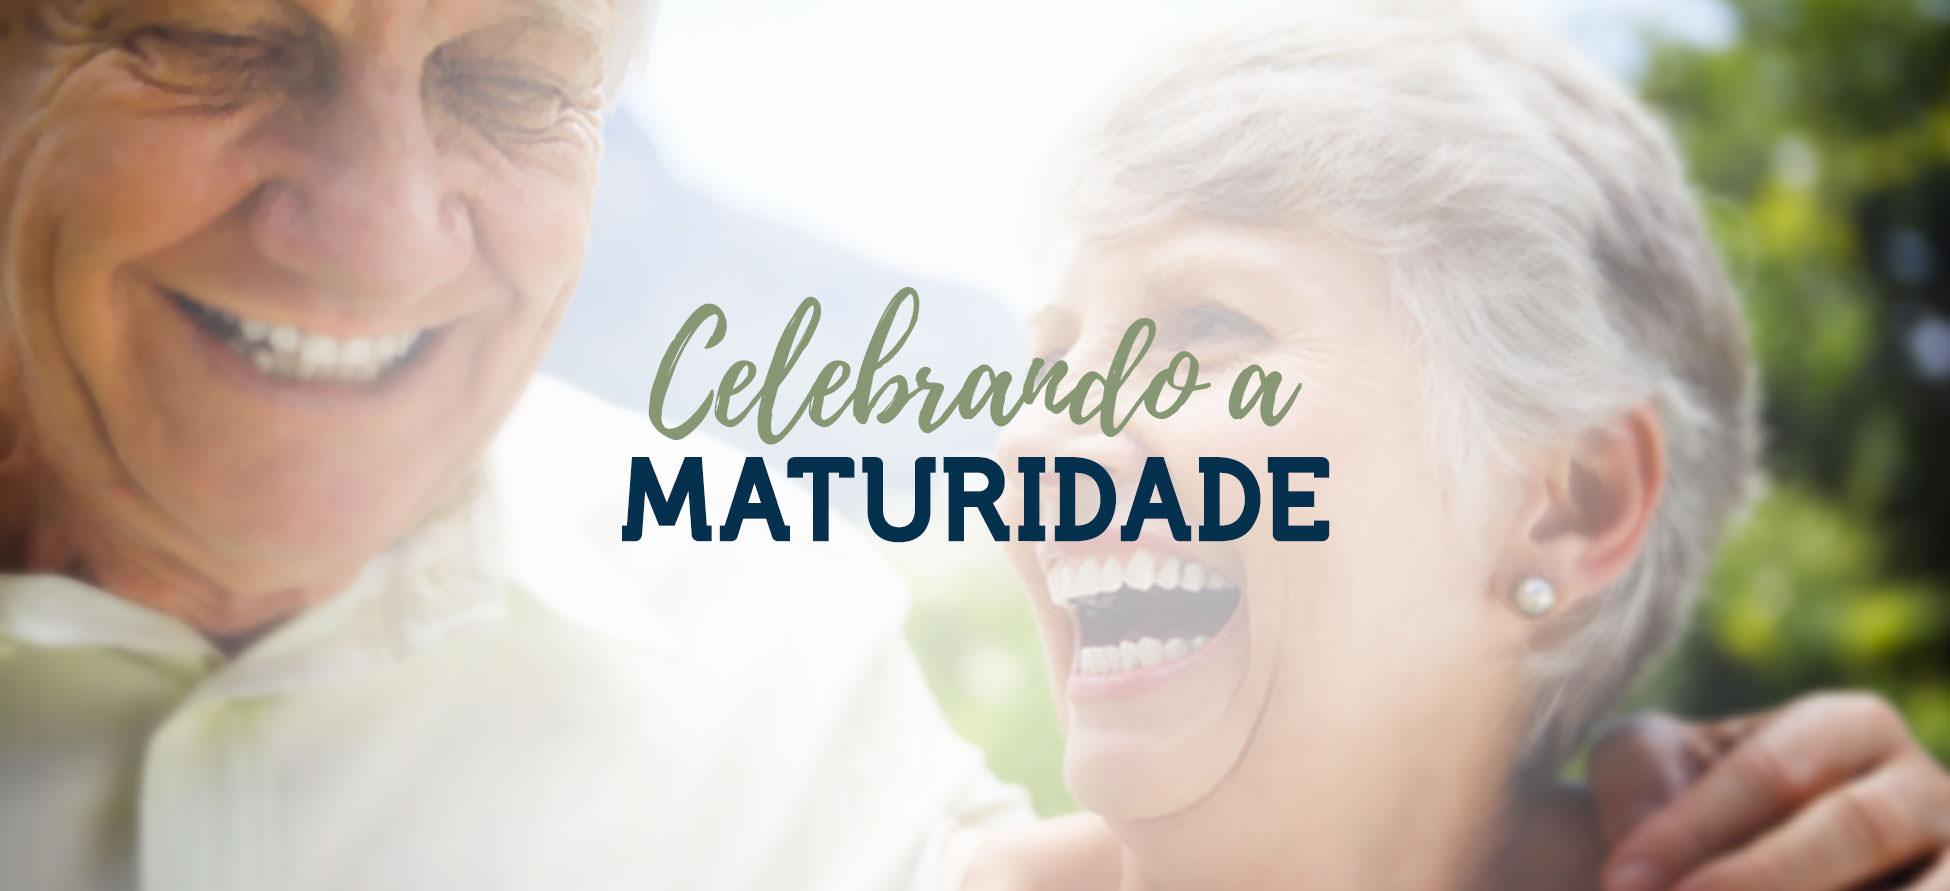 Maturidade_1950x891px_2019